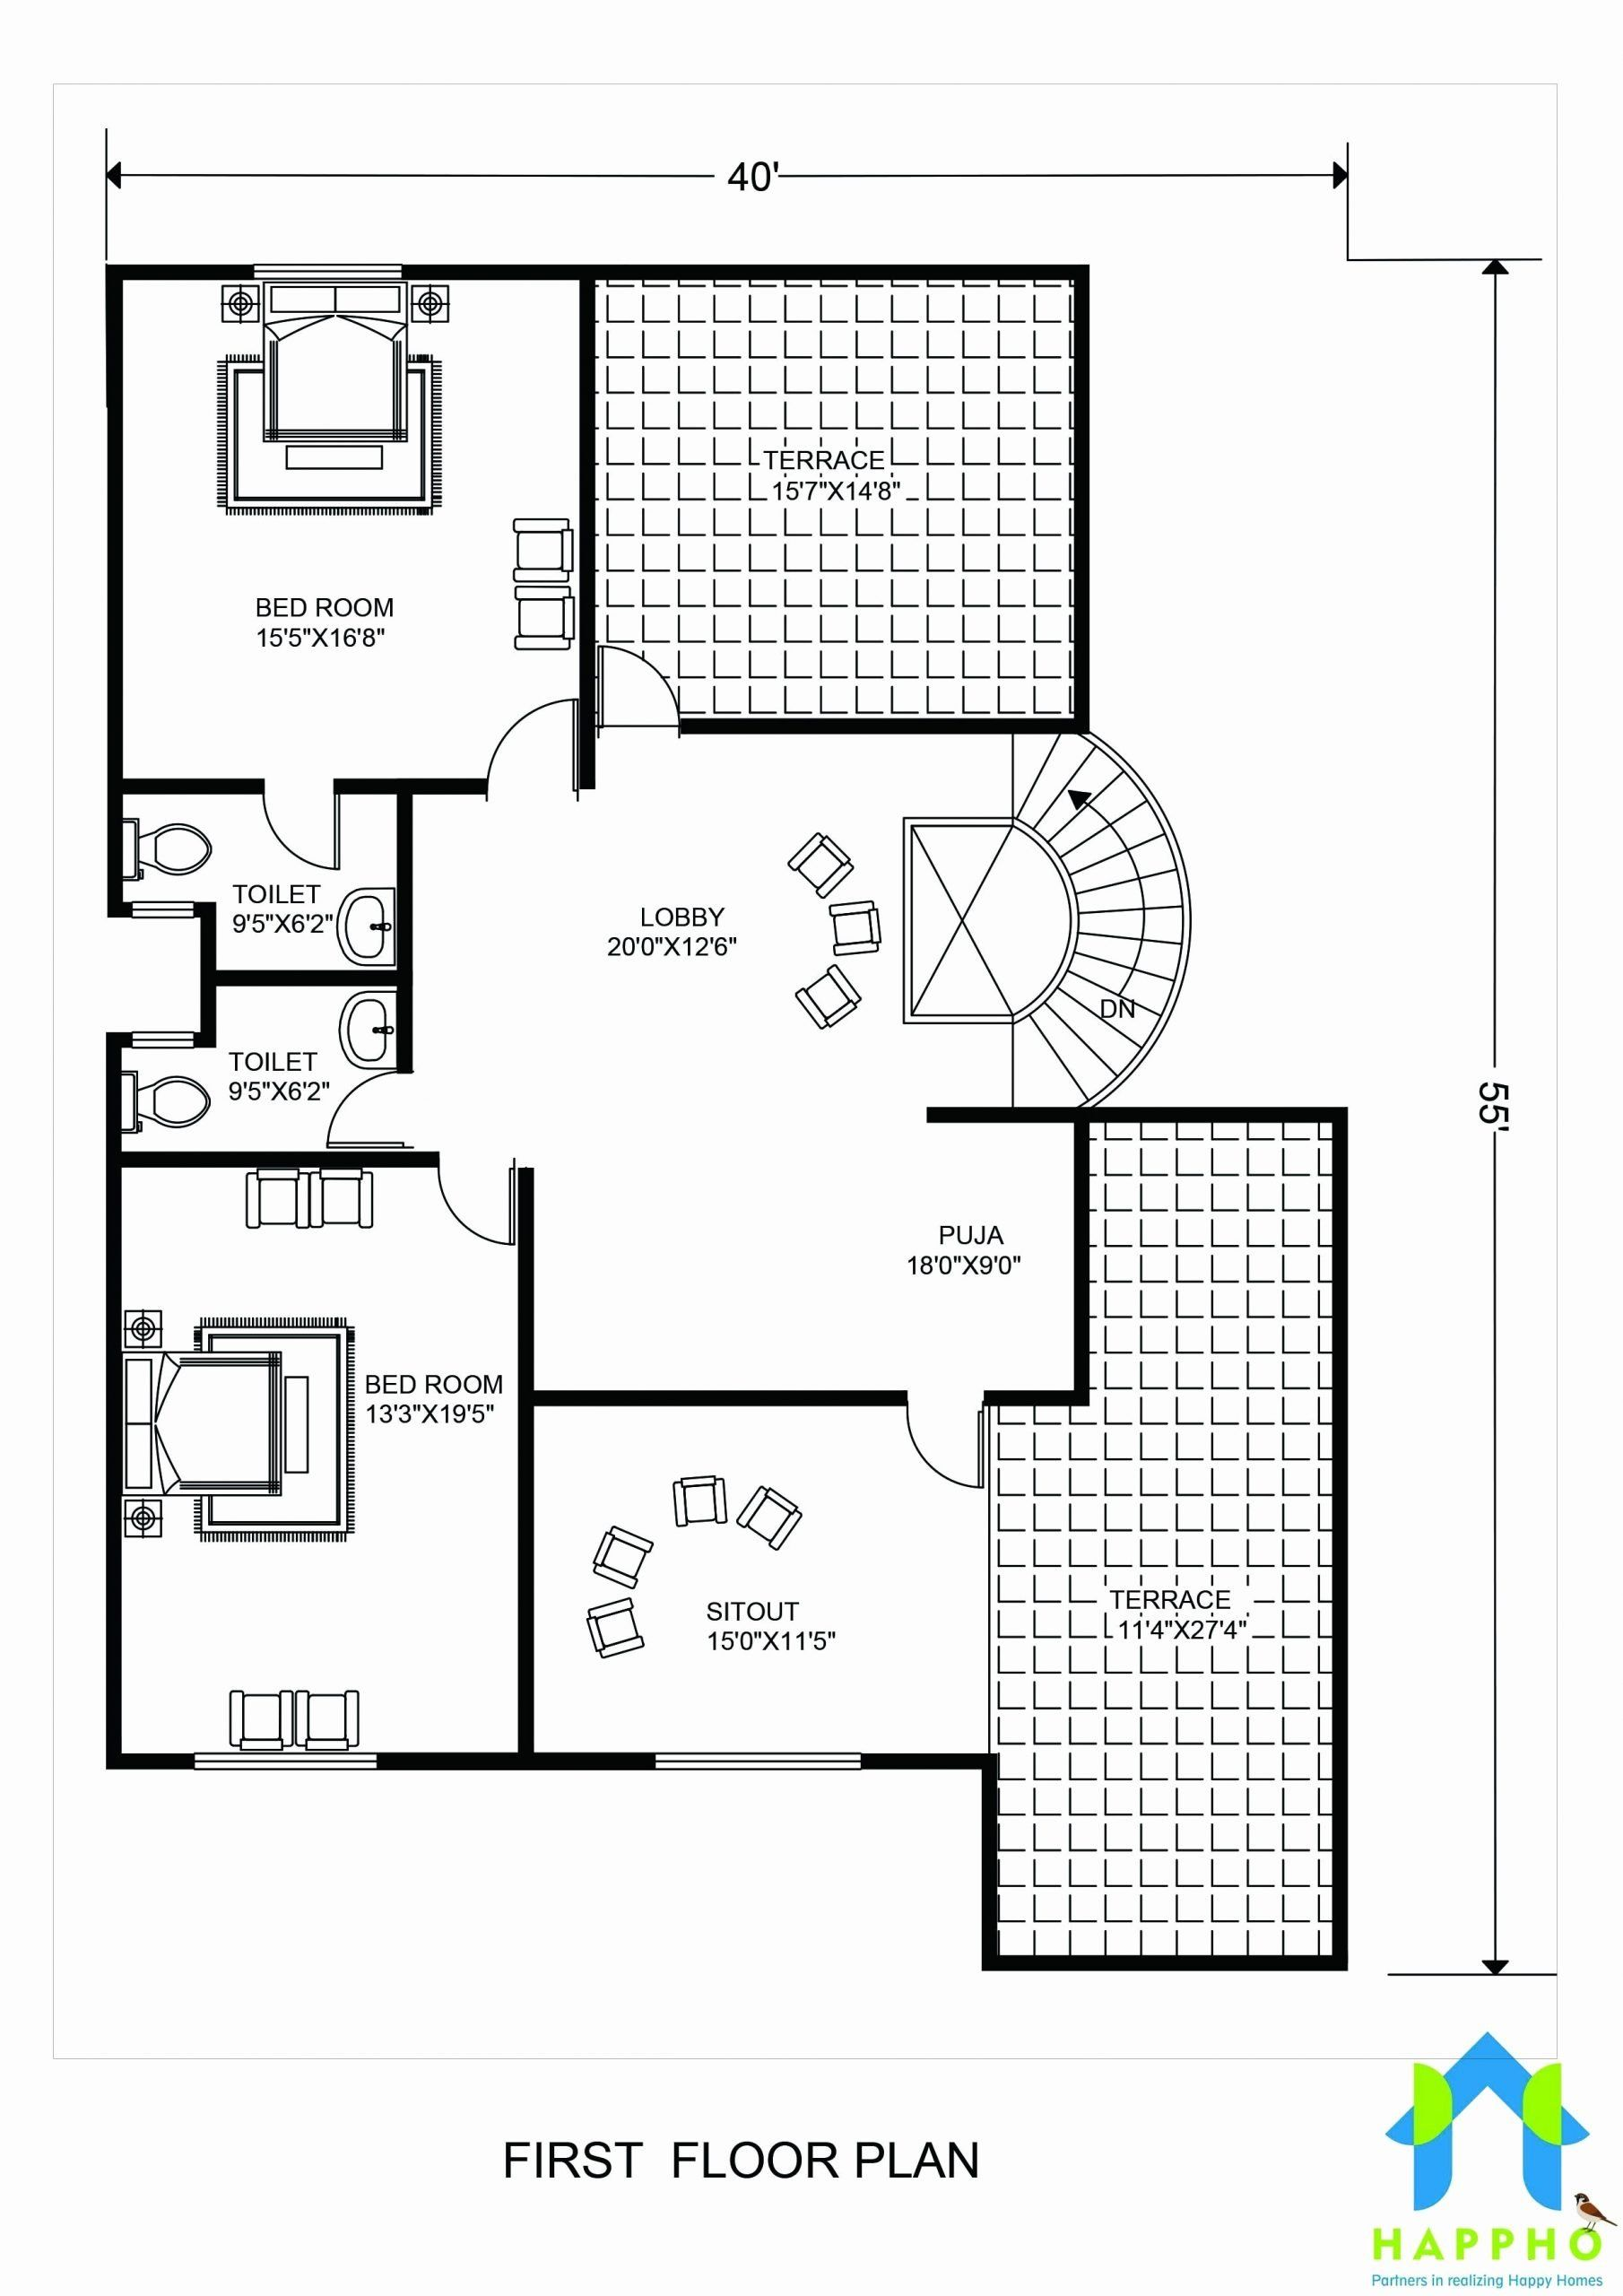 2200 Square Feet Home Design New Floor Plan For 40 X 55 Feet Plot In 2020 Unique Floor Plans 2200 Sq Ft House Plans Luxury Floor Plans